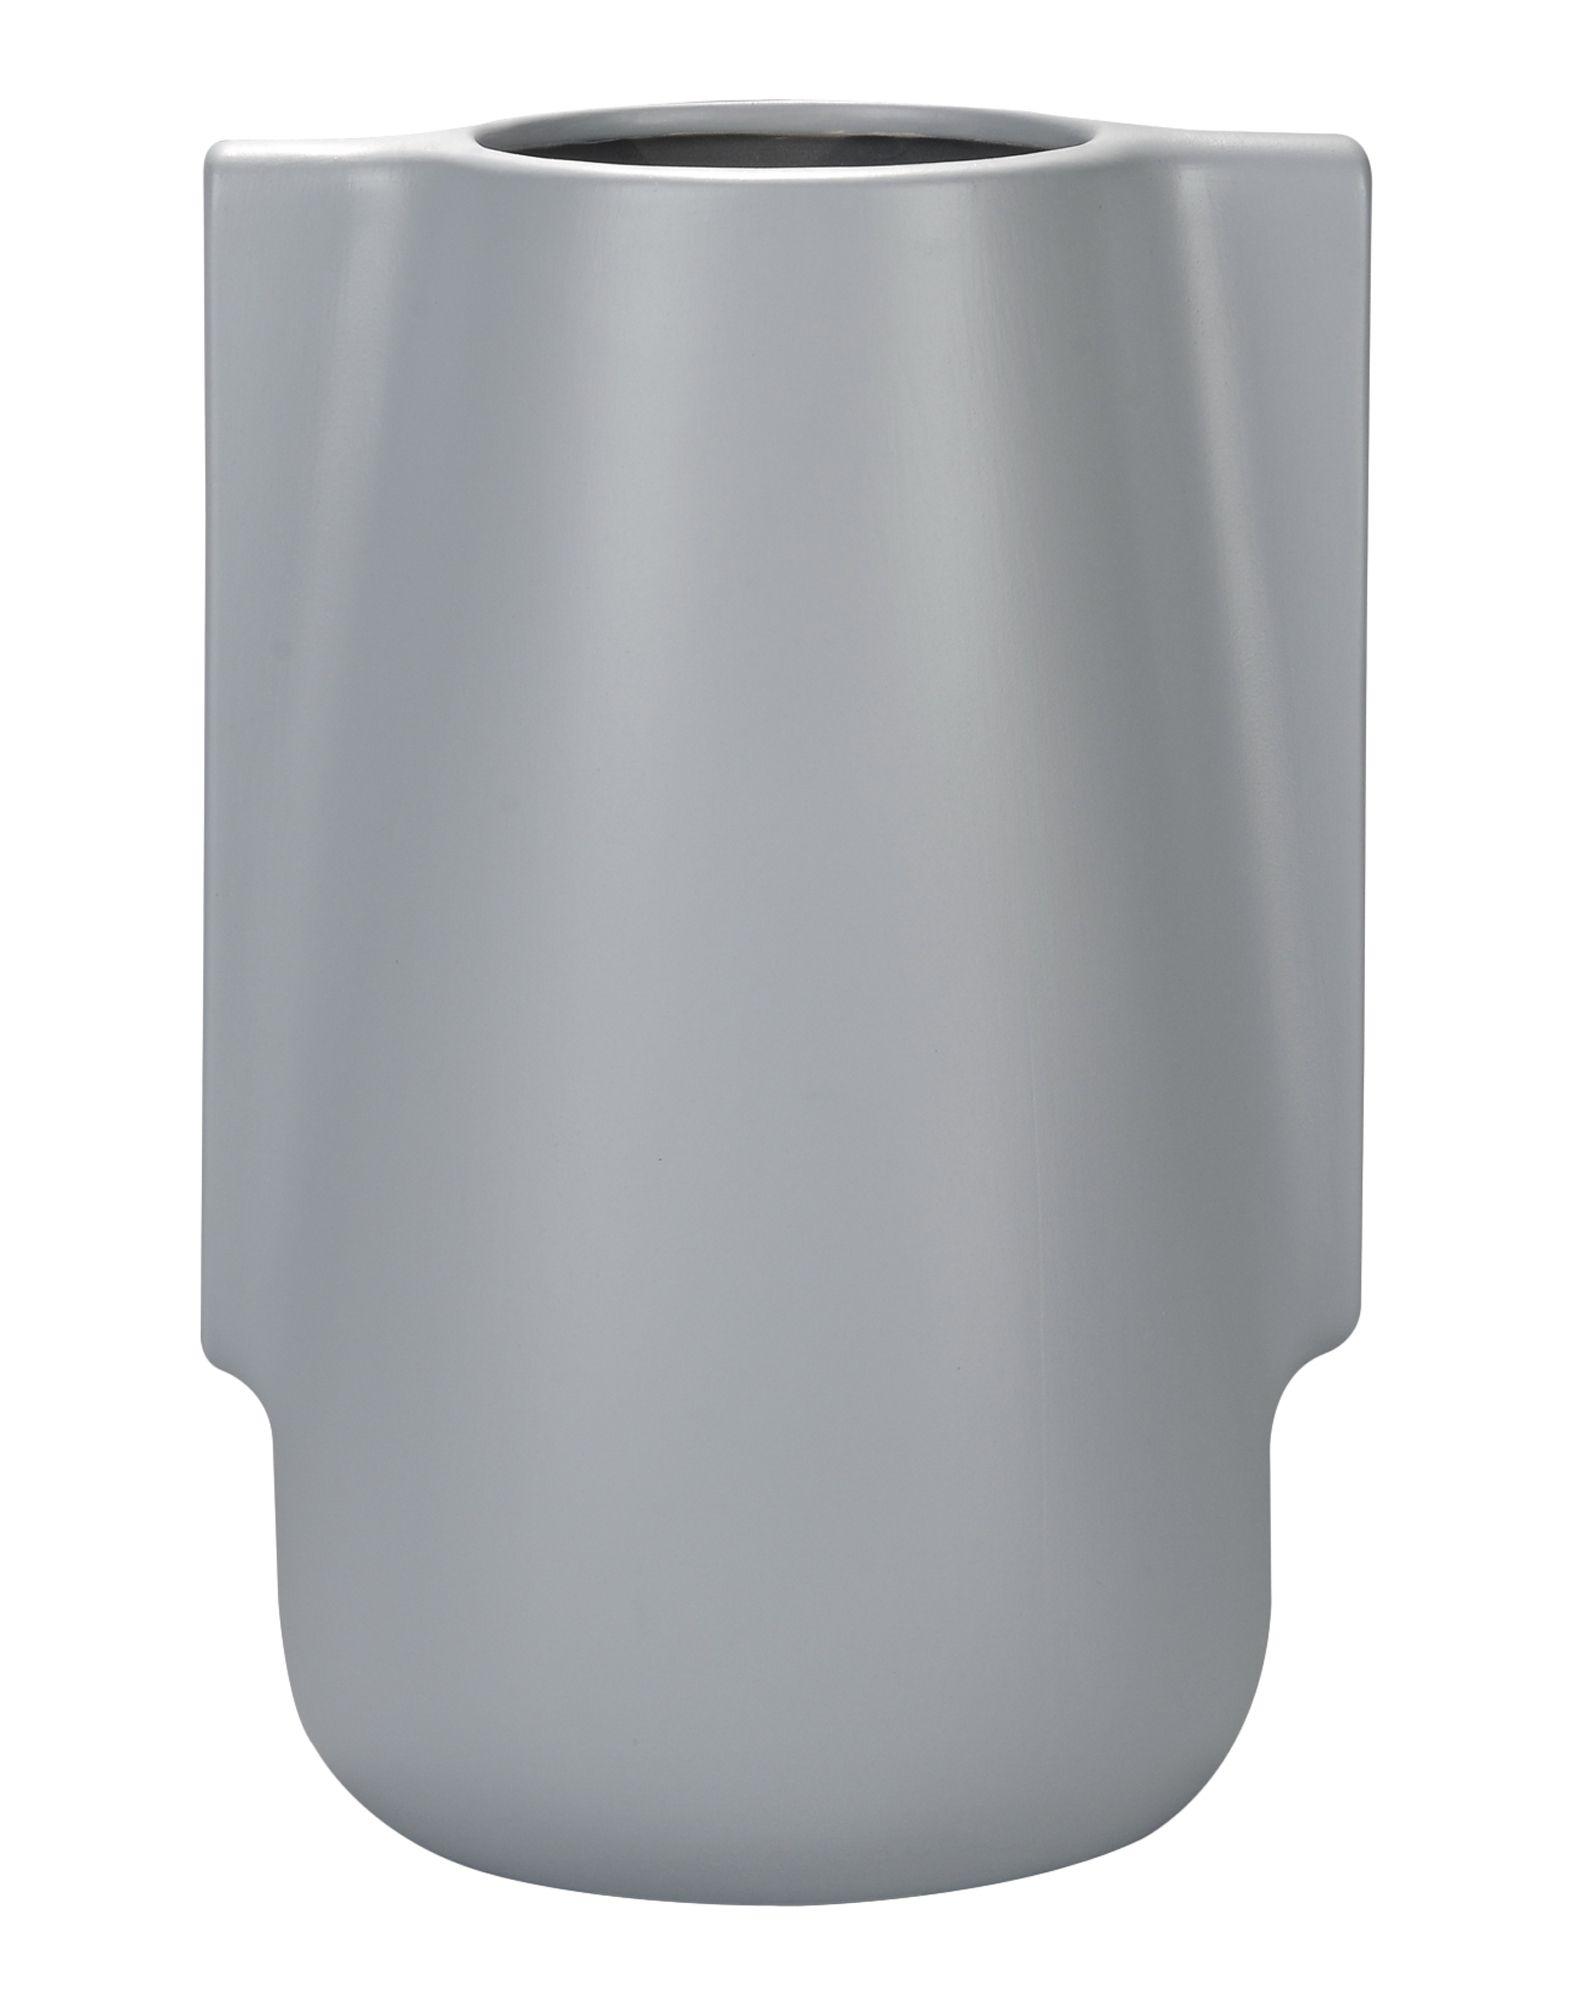 INCIPIT Unisex Vase Farbe Grau Größe 1